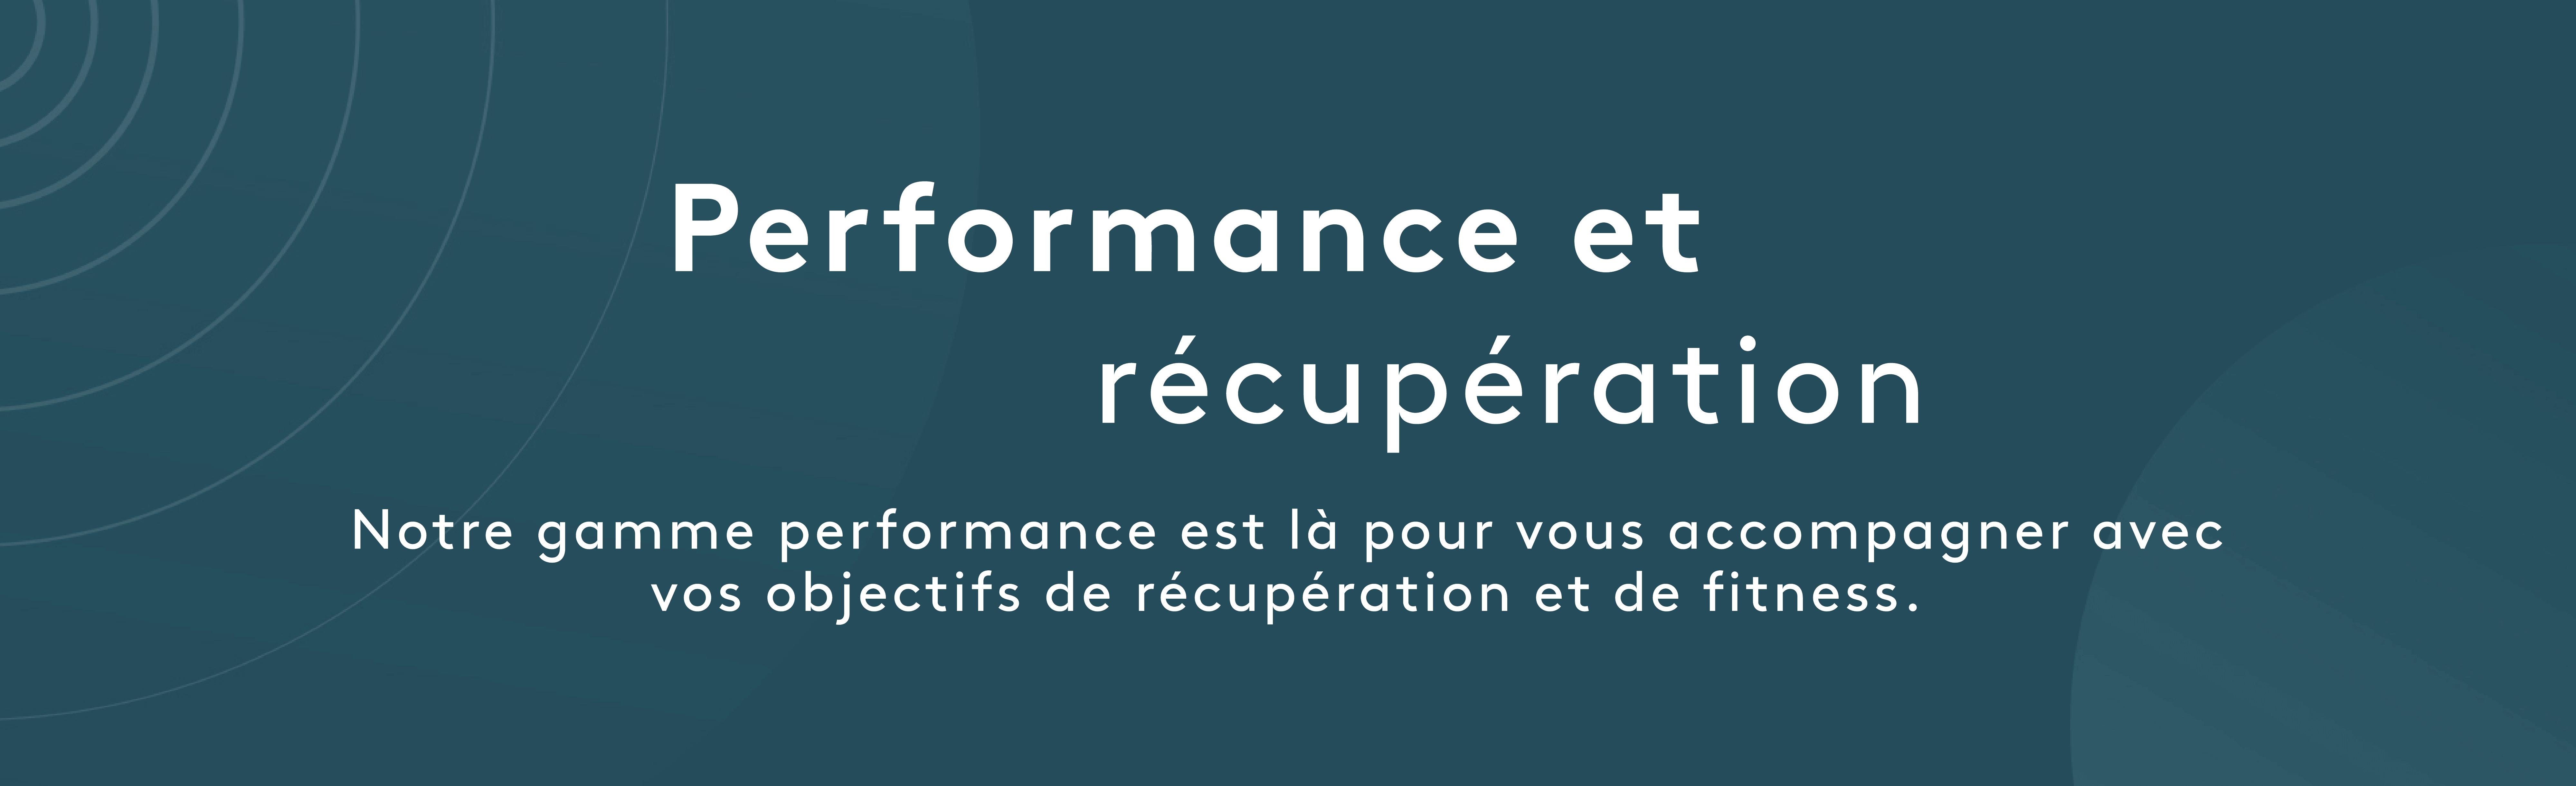 Performance | Myvitamins